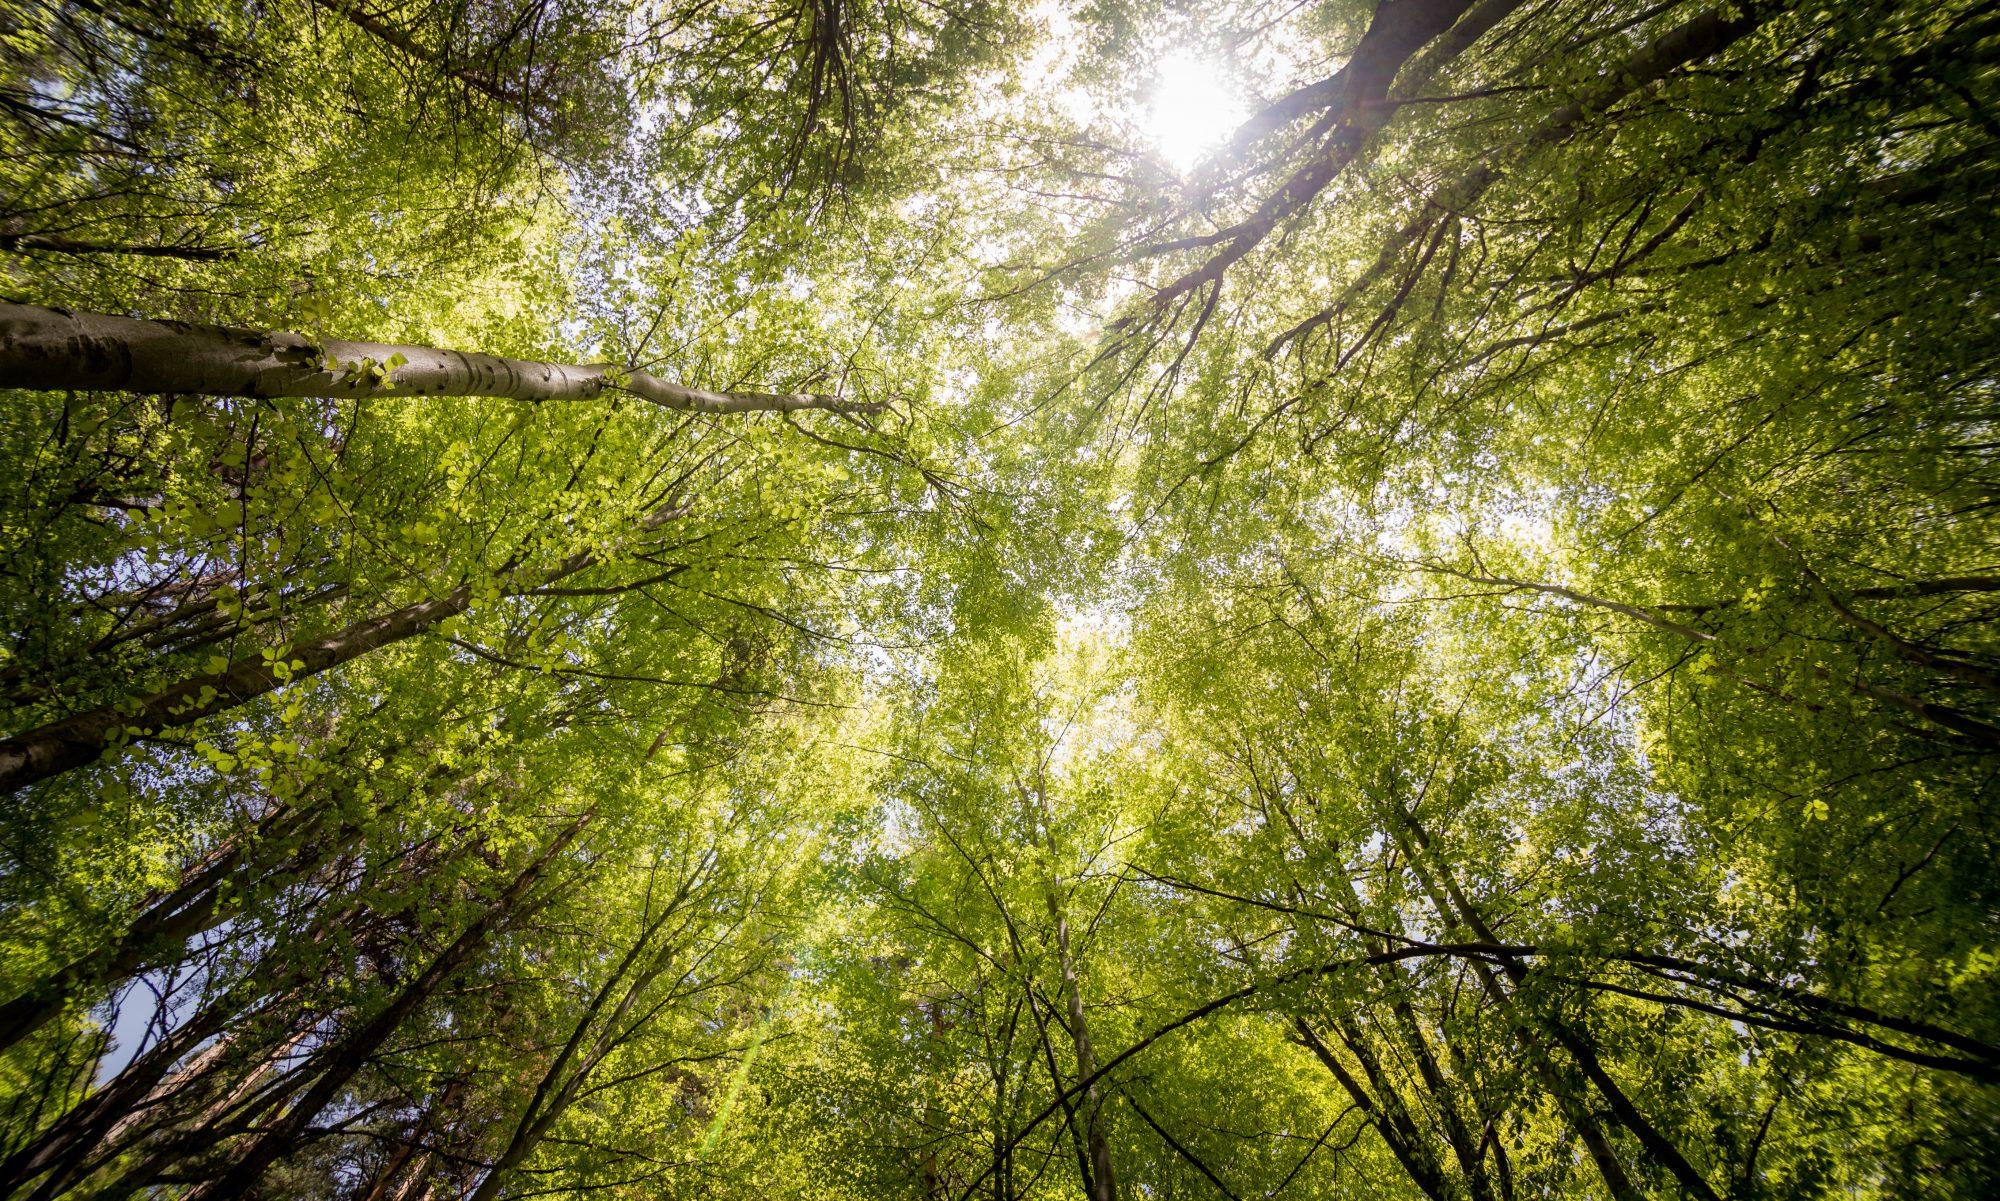 Co-creating abundance through generative change